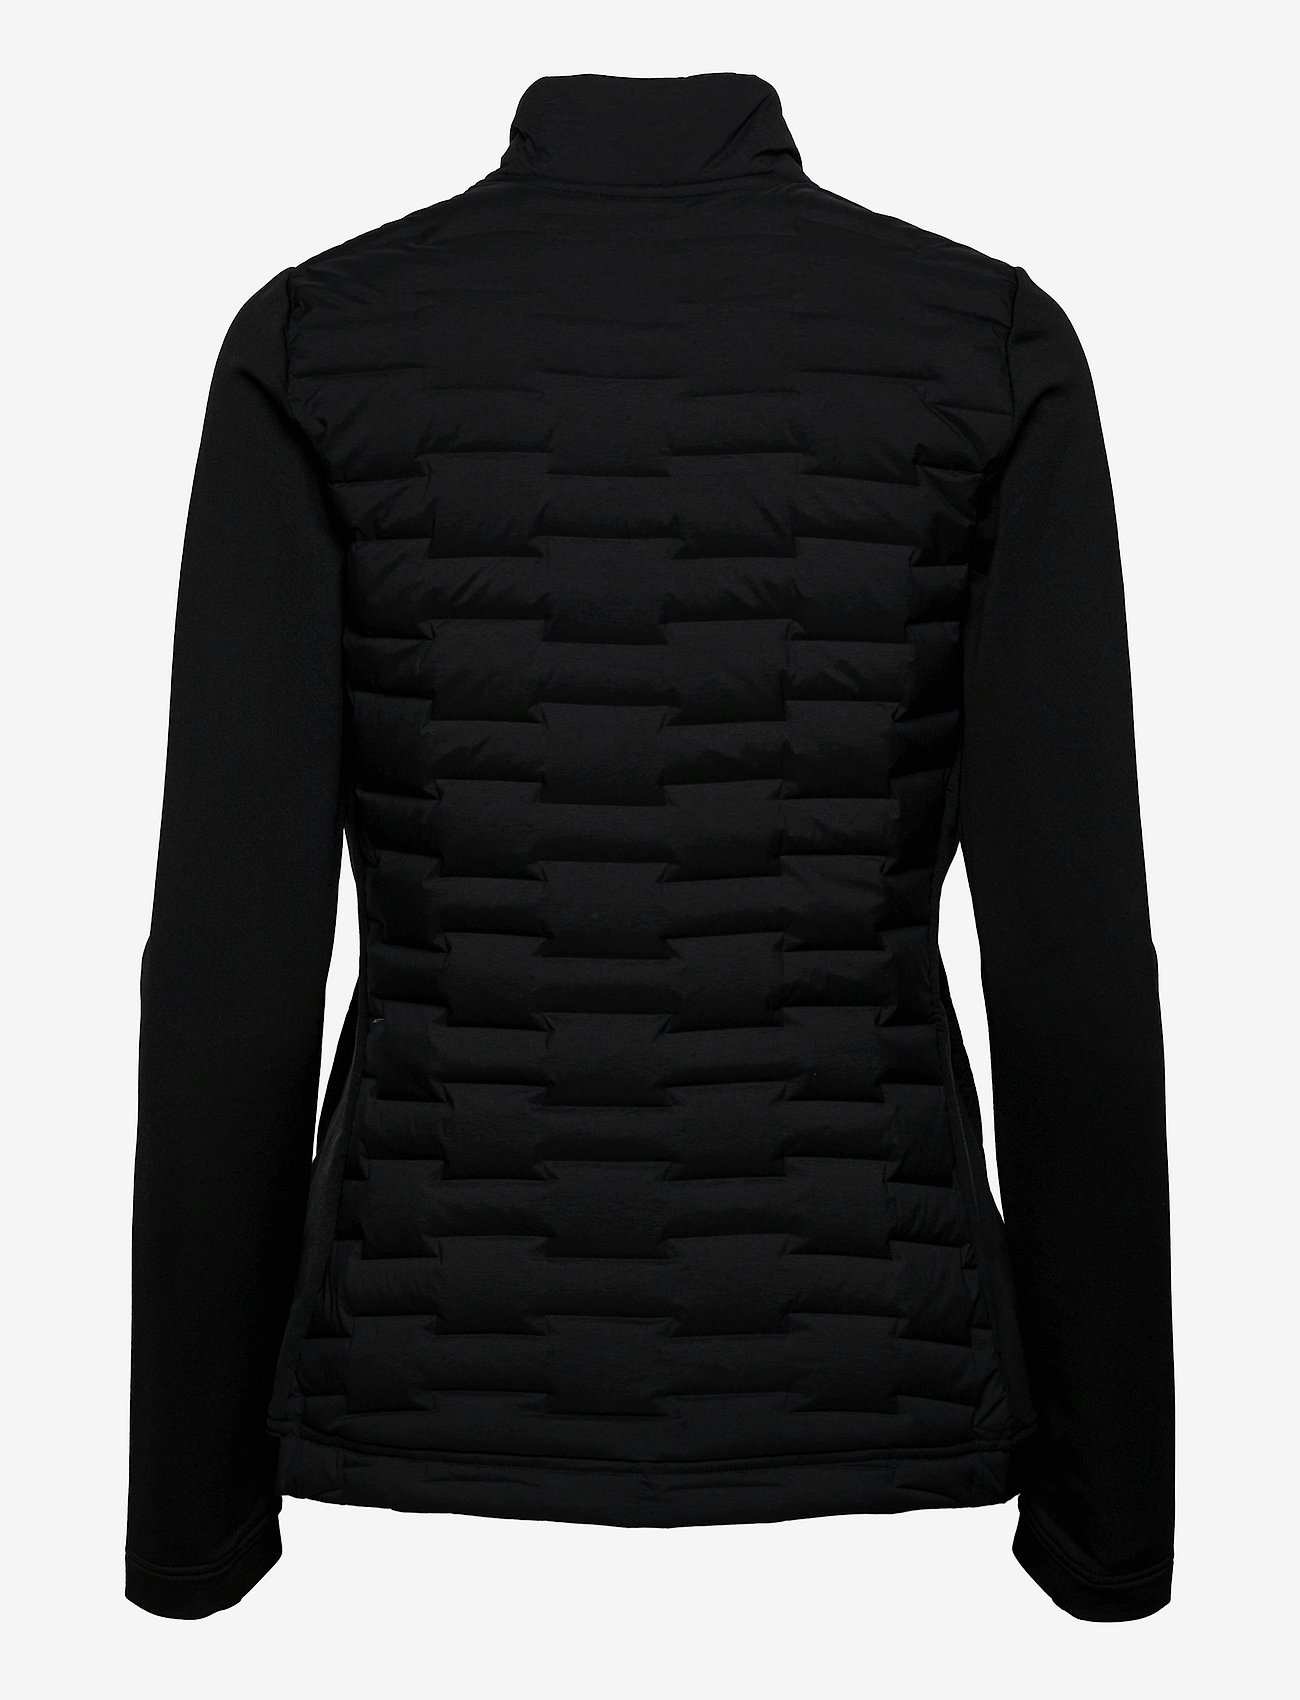 adidas Golf - FRSTGD JKT - vestes de golf - black - 1